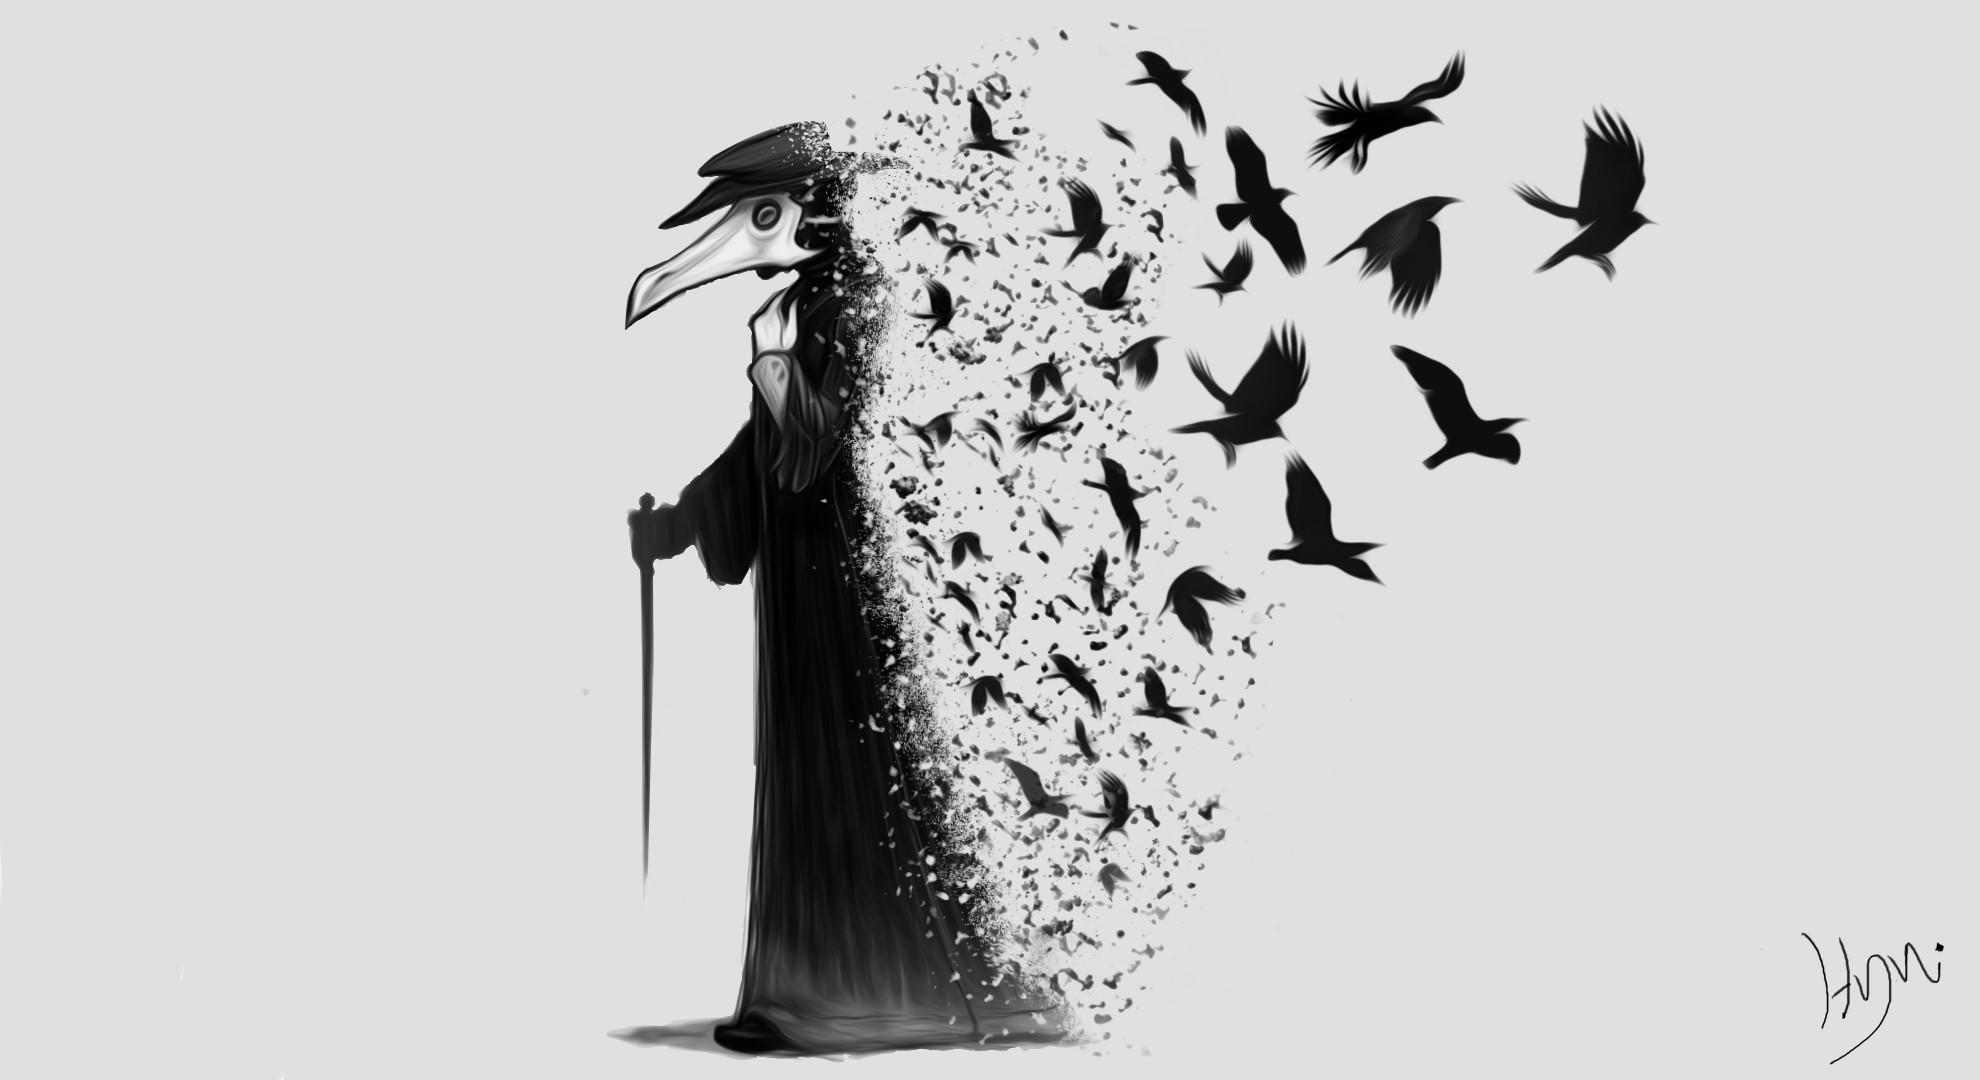 1980x1080 Px Black Crow Dark Plague Doctors Raven The Darkness